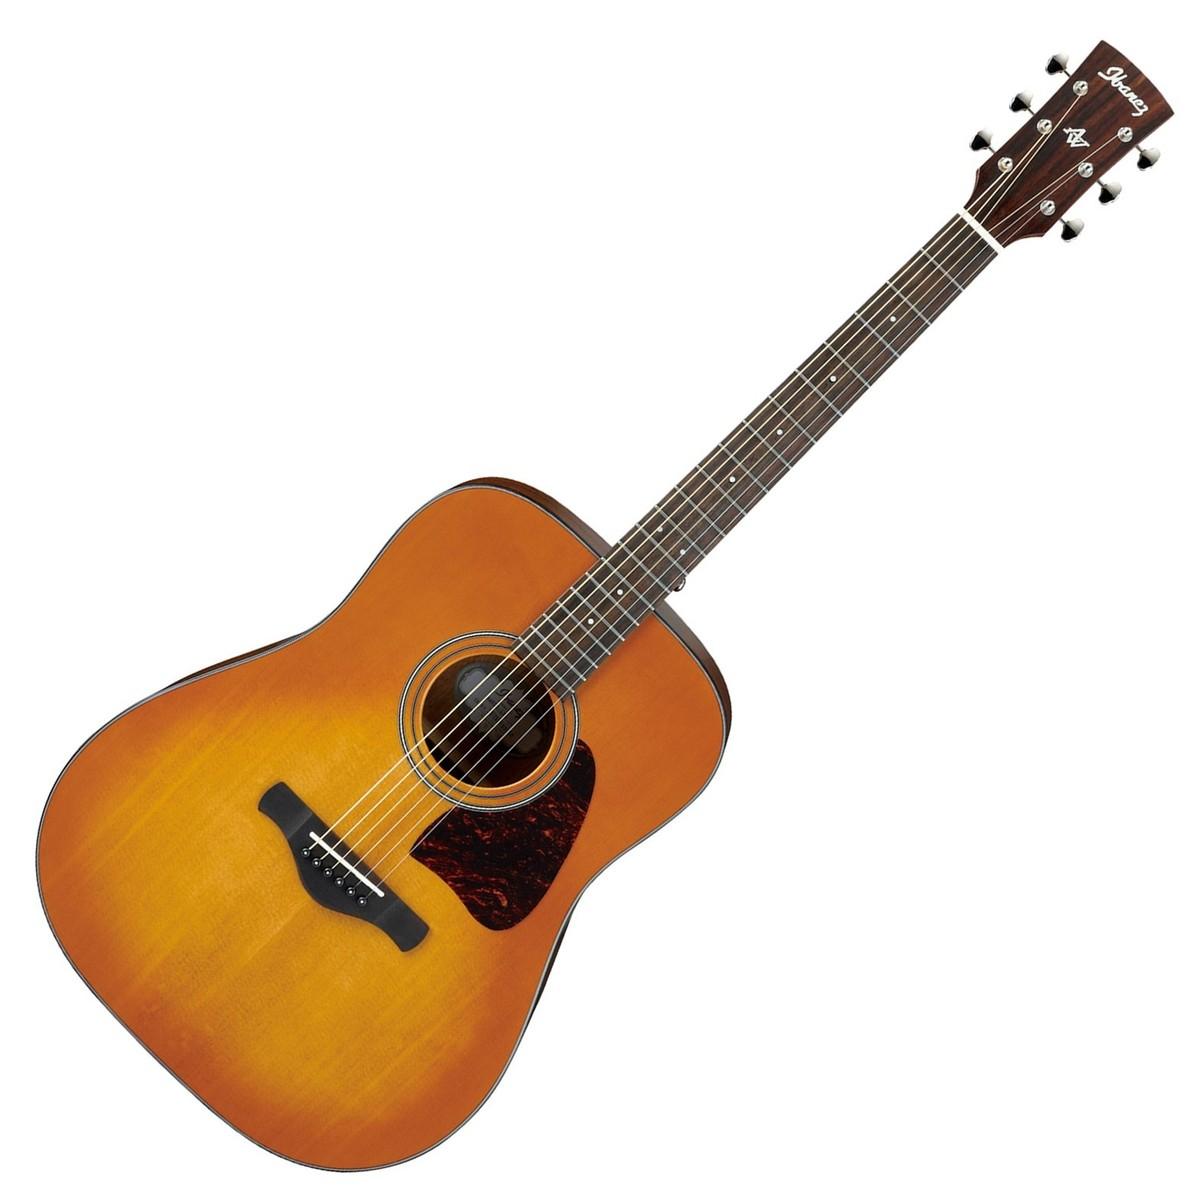 Image of Ibanez AW400 Acoustic Guitar Light Violin Sunburst High Gloss